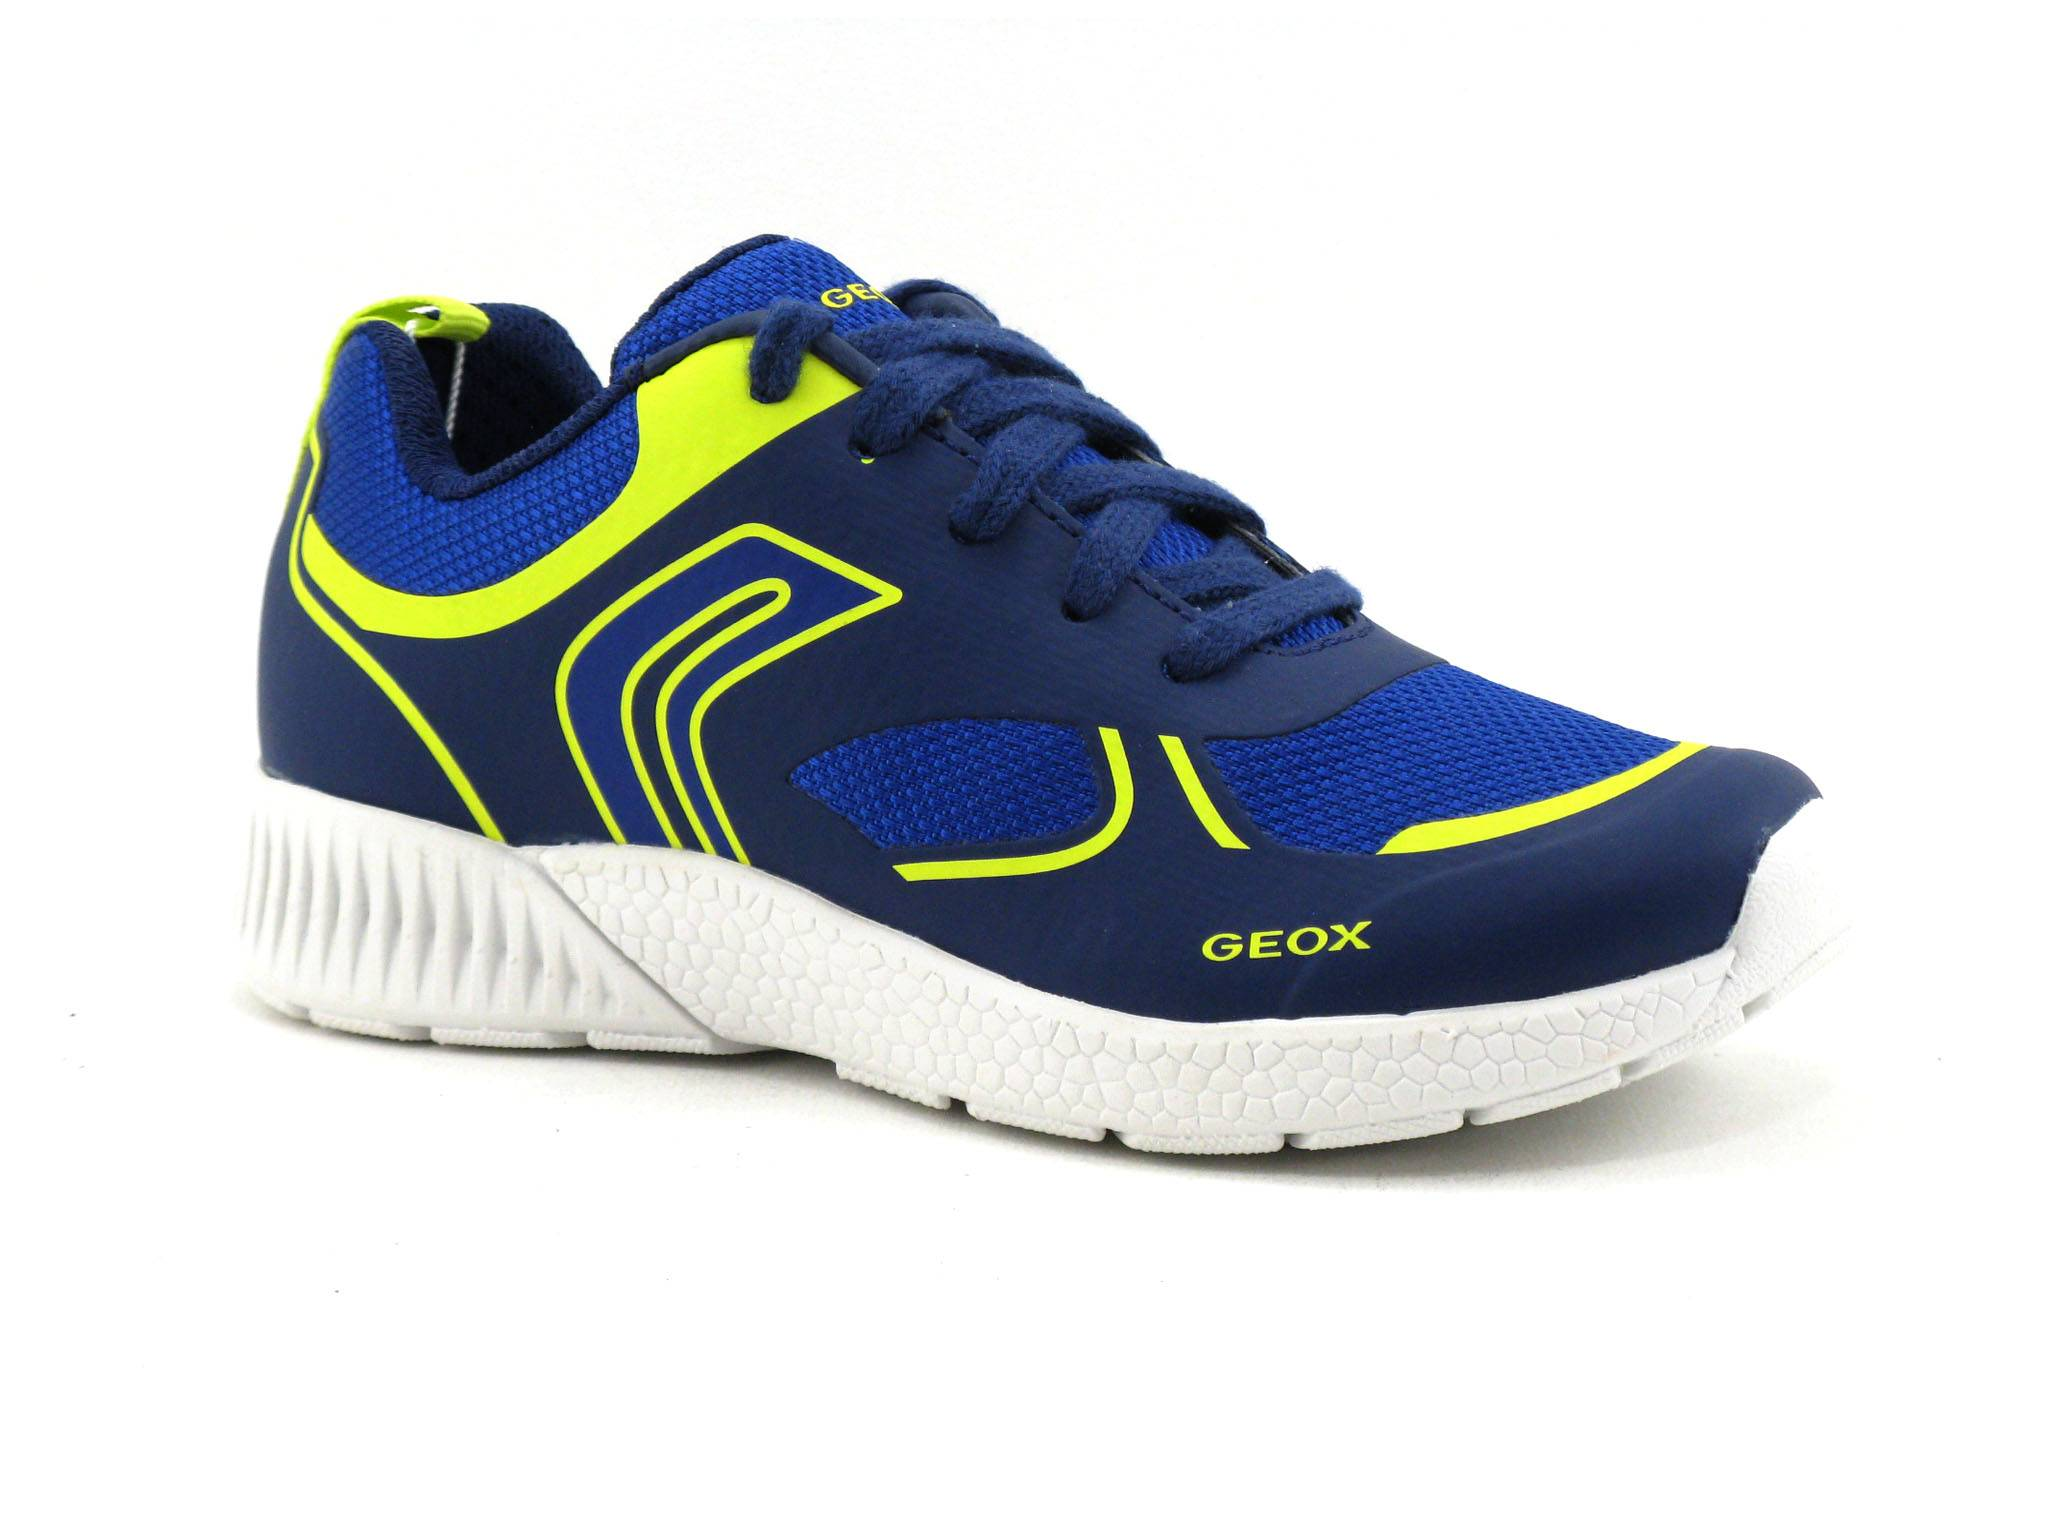 Geox Basket Enfant Geox - Bleu,Jaune - Point. 28,29,30,31,32,33,34,35